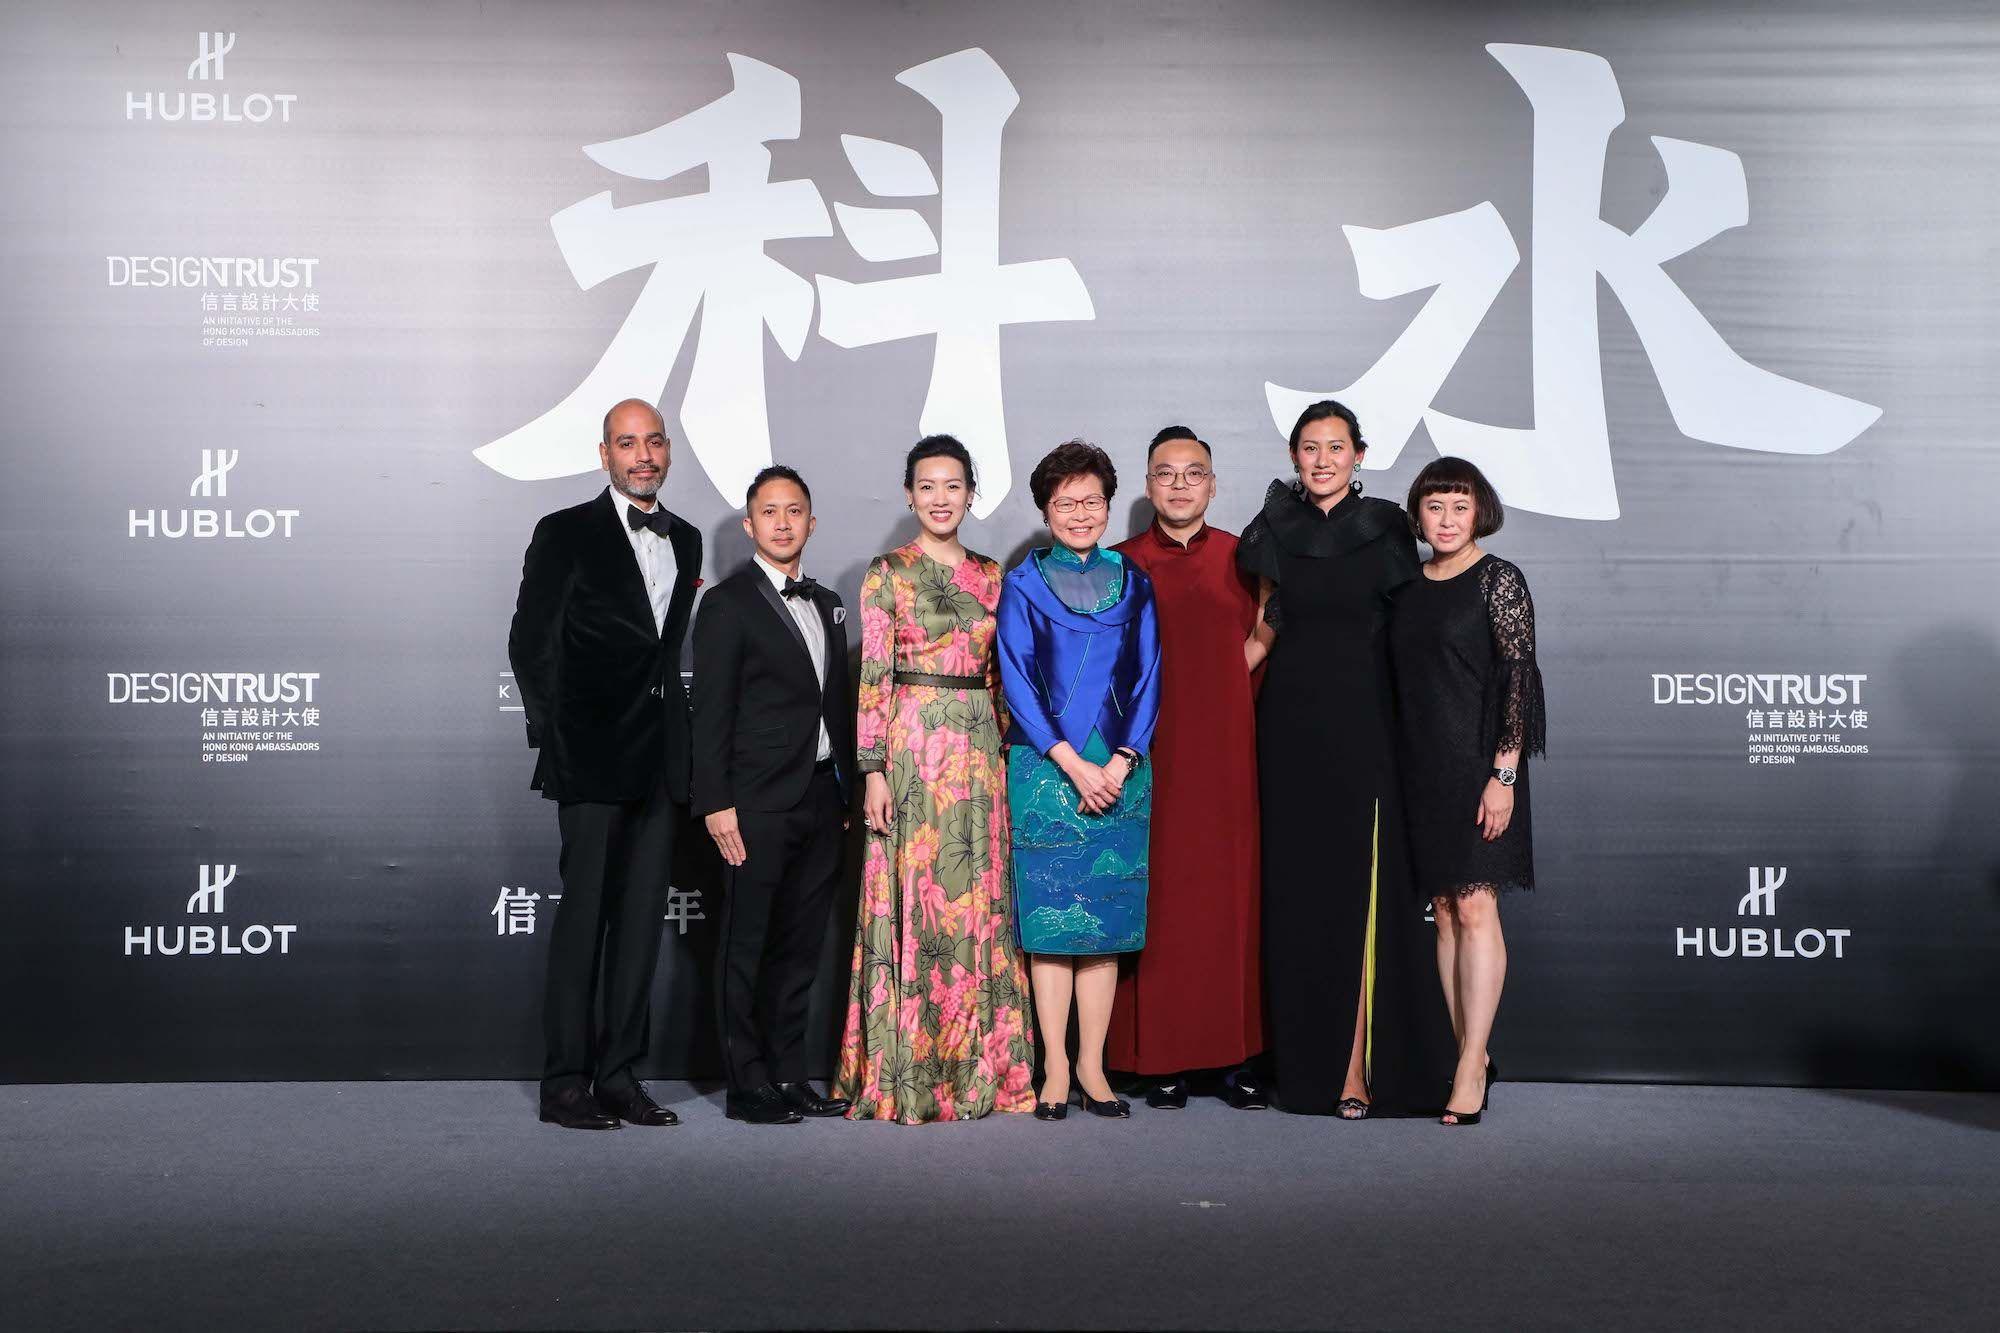 The Design Trust Board of Directors: Jay Parmanand, Jehan Chu, Joyce Tam, Hong Kong Chief Executive Carrie Lam, Alan Lo, Marisa Yiu, Desiree Au